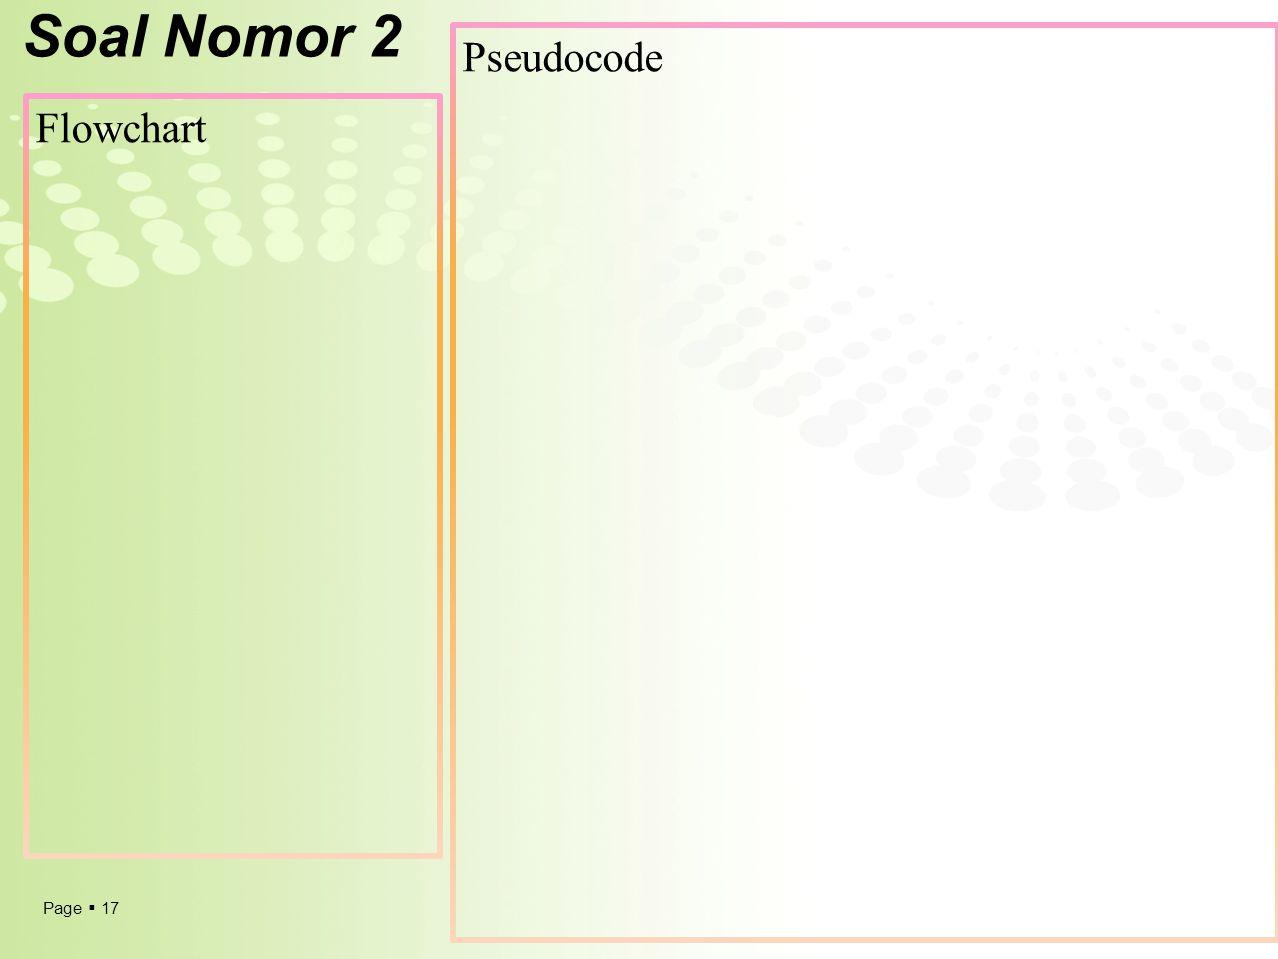 Soal Nomor 2 Pseudocode Flowchart